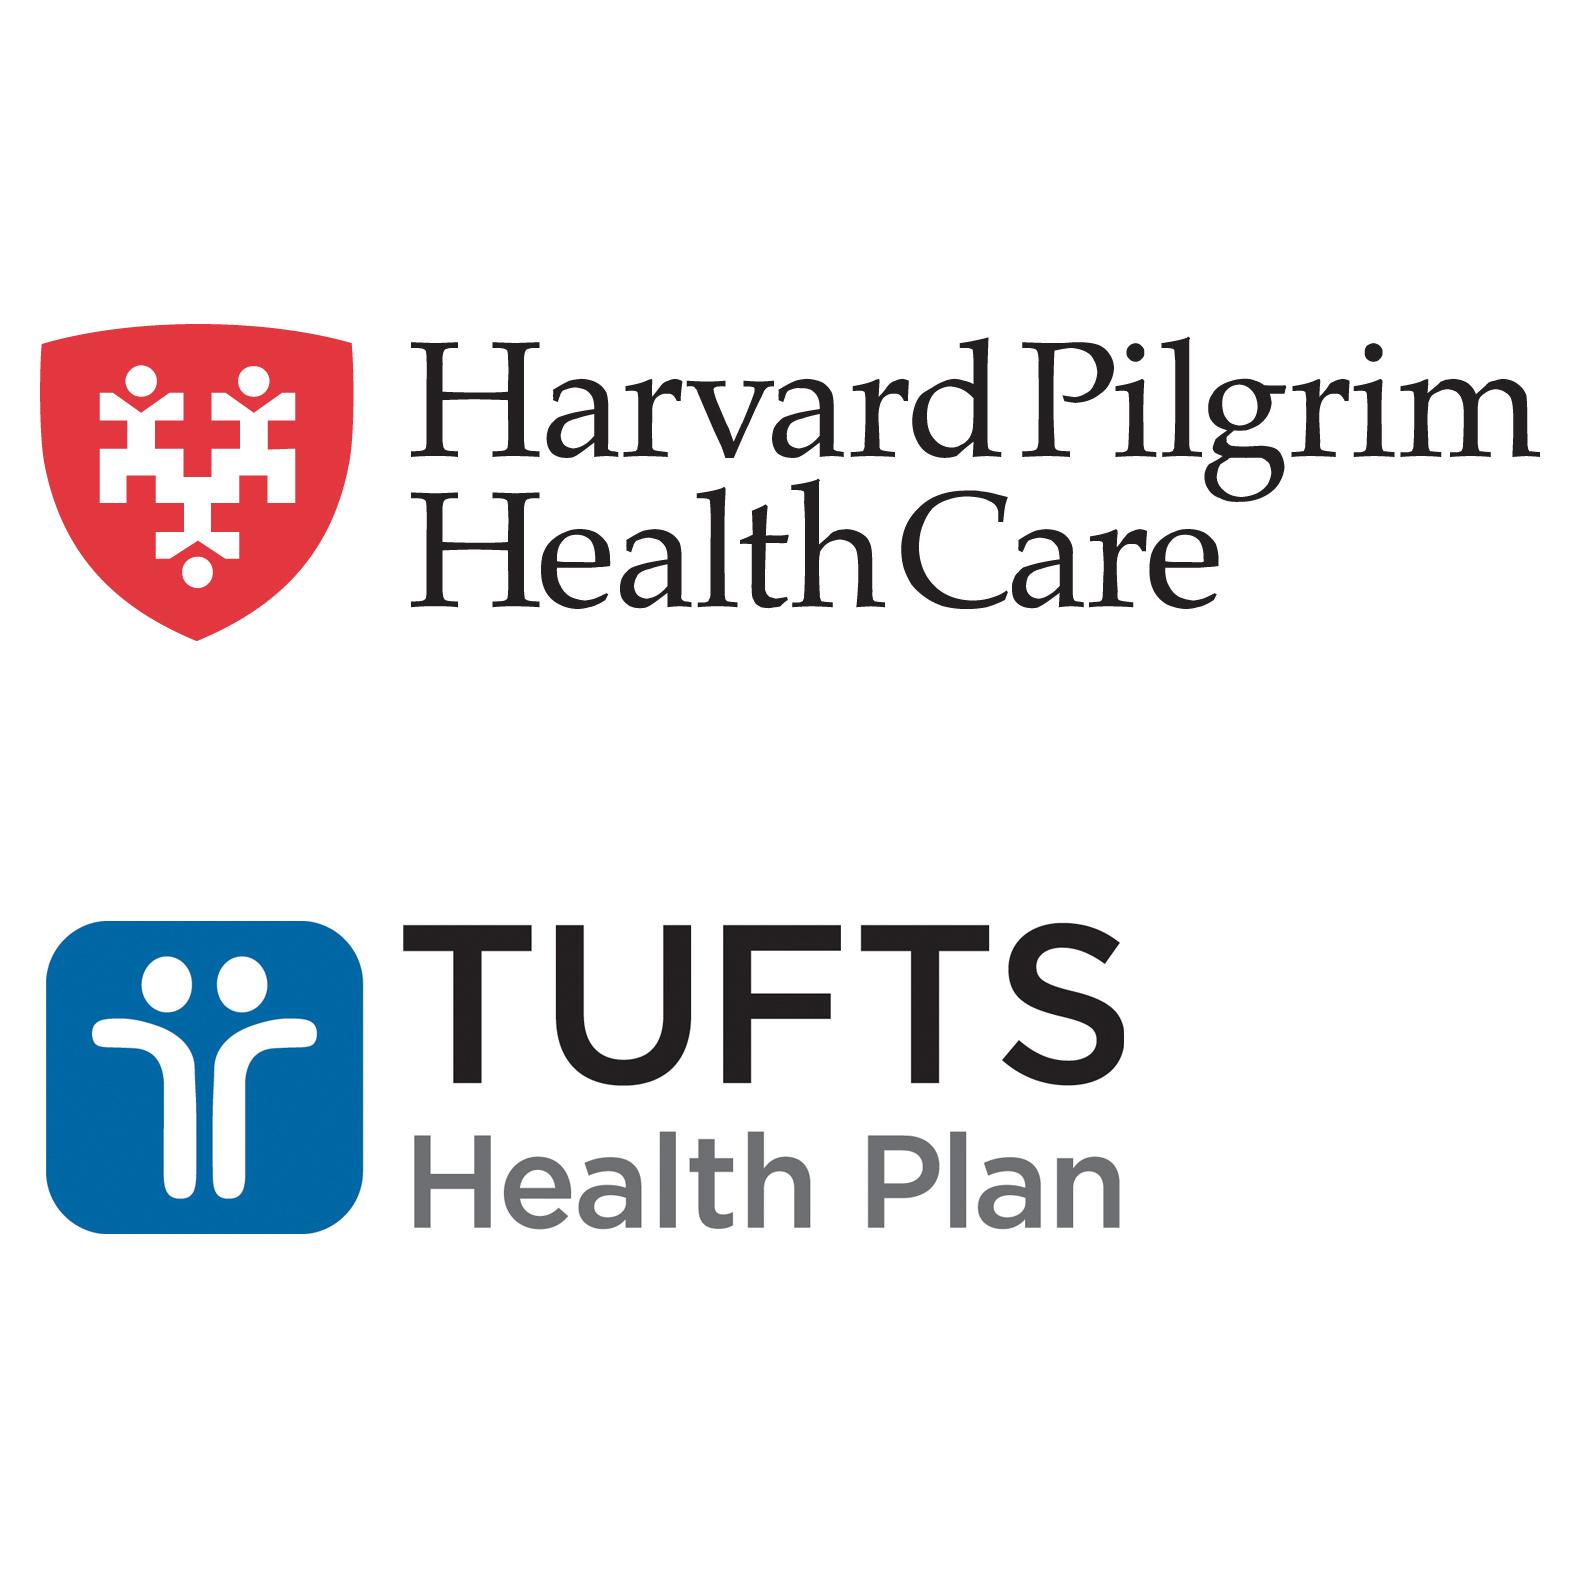 Harvard Pilgrim Healthcare and Tuft Health Plan